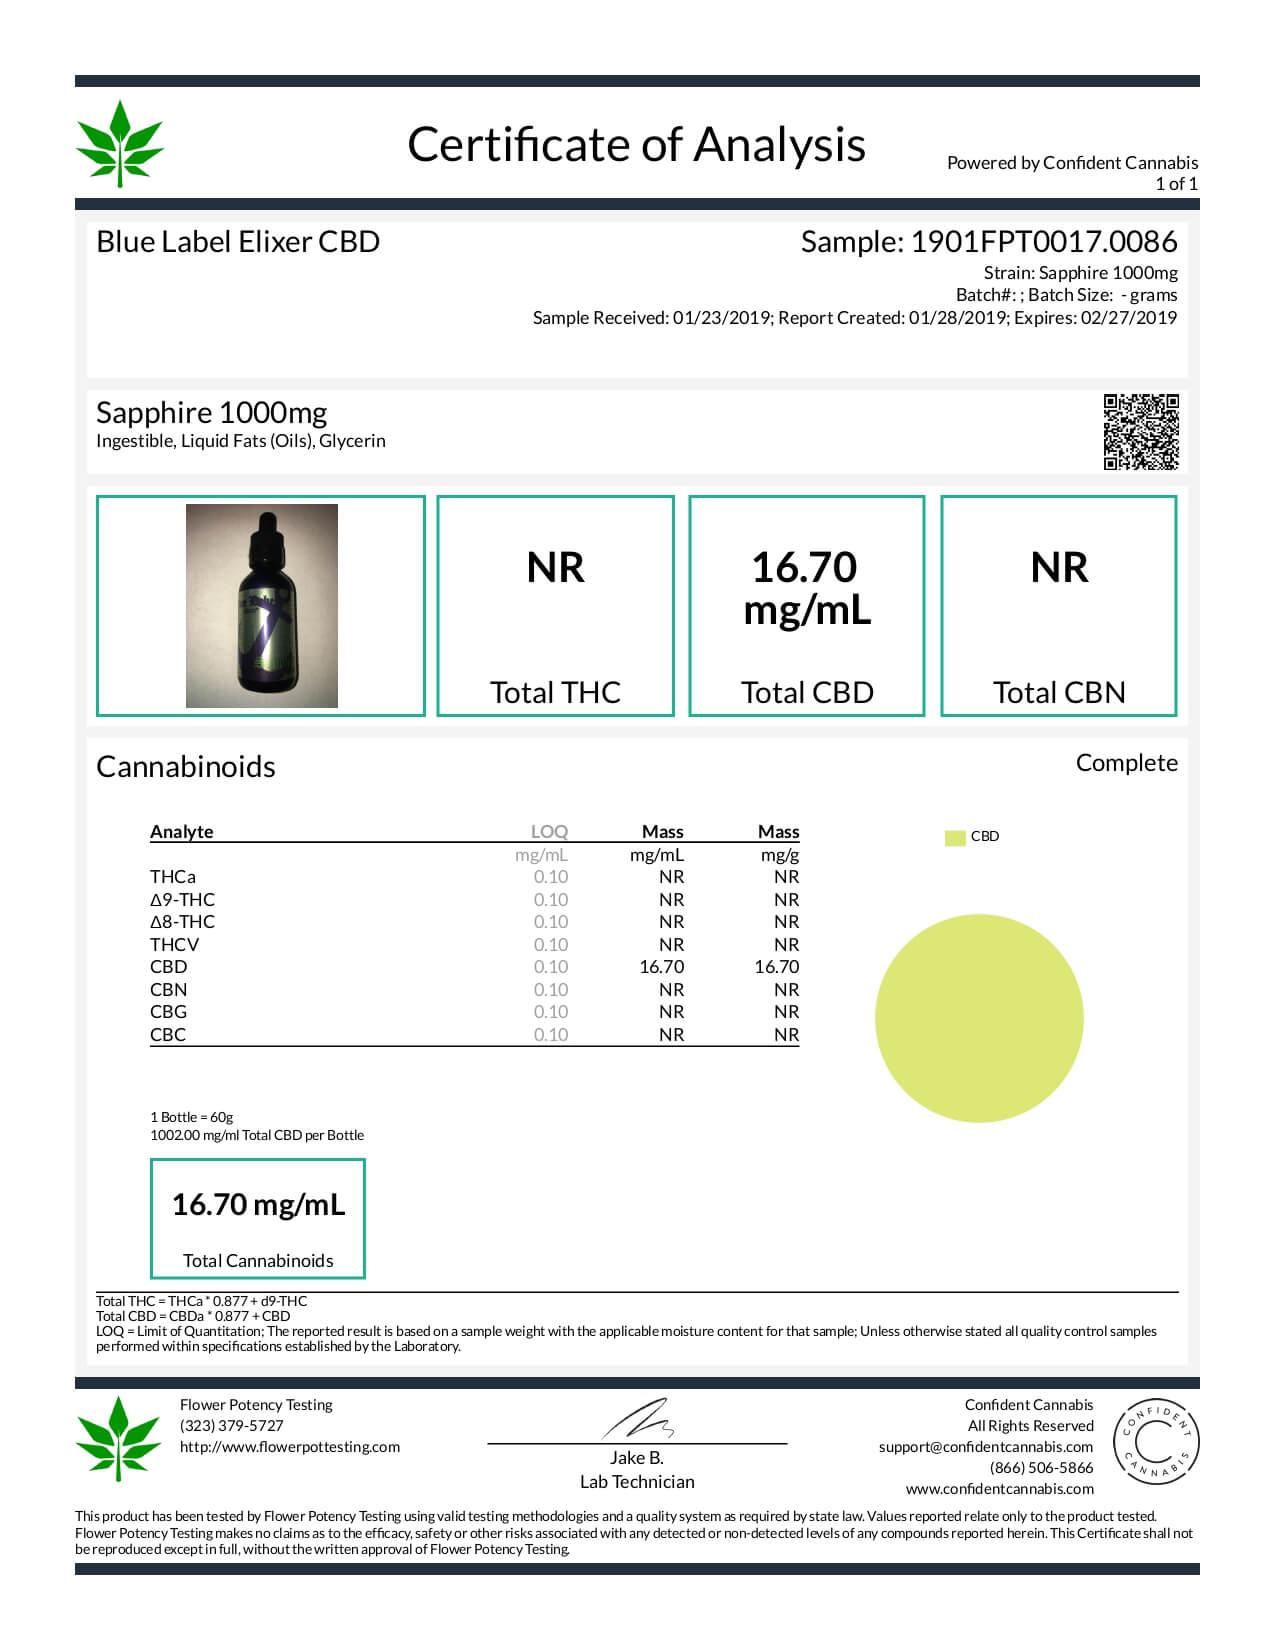 Blue Label CBD Vape Juice Sapphire 1000mg Lab Report